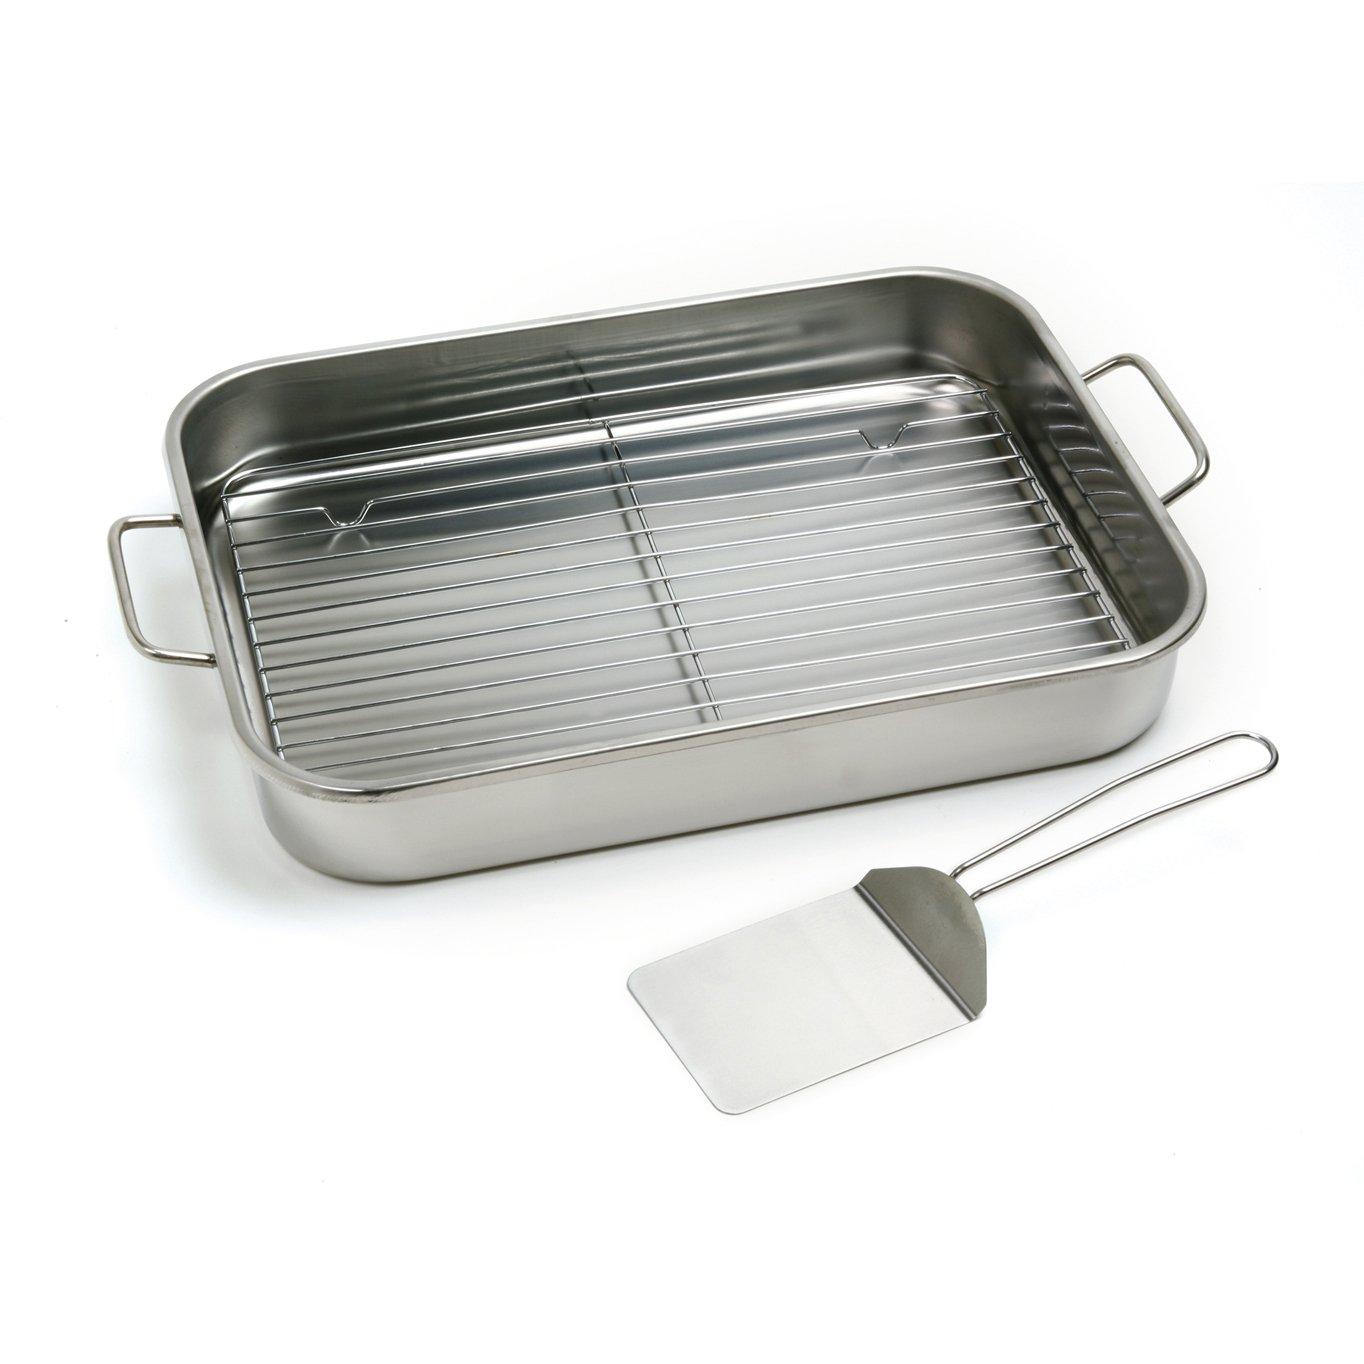 Norpro 12 by 16 Inch Stainless Steel Roast Lasagna Pan